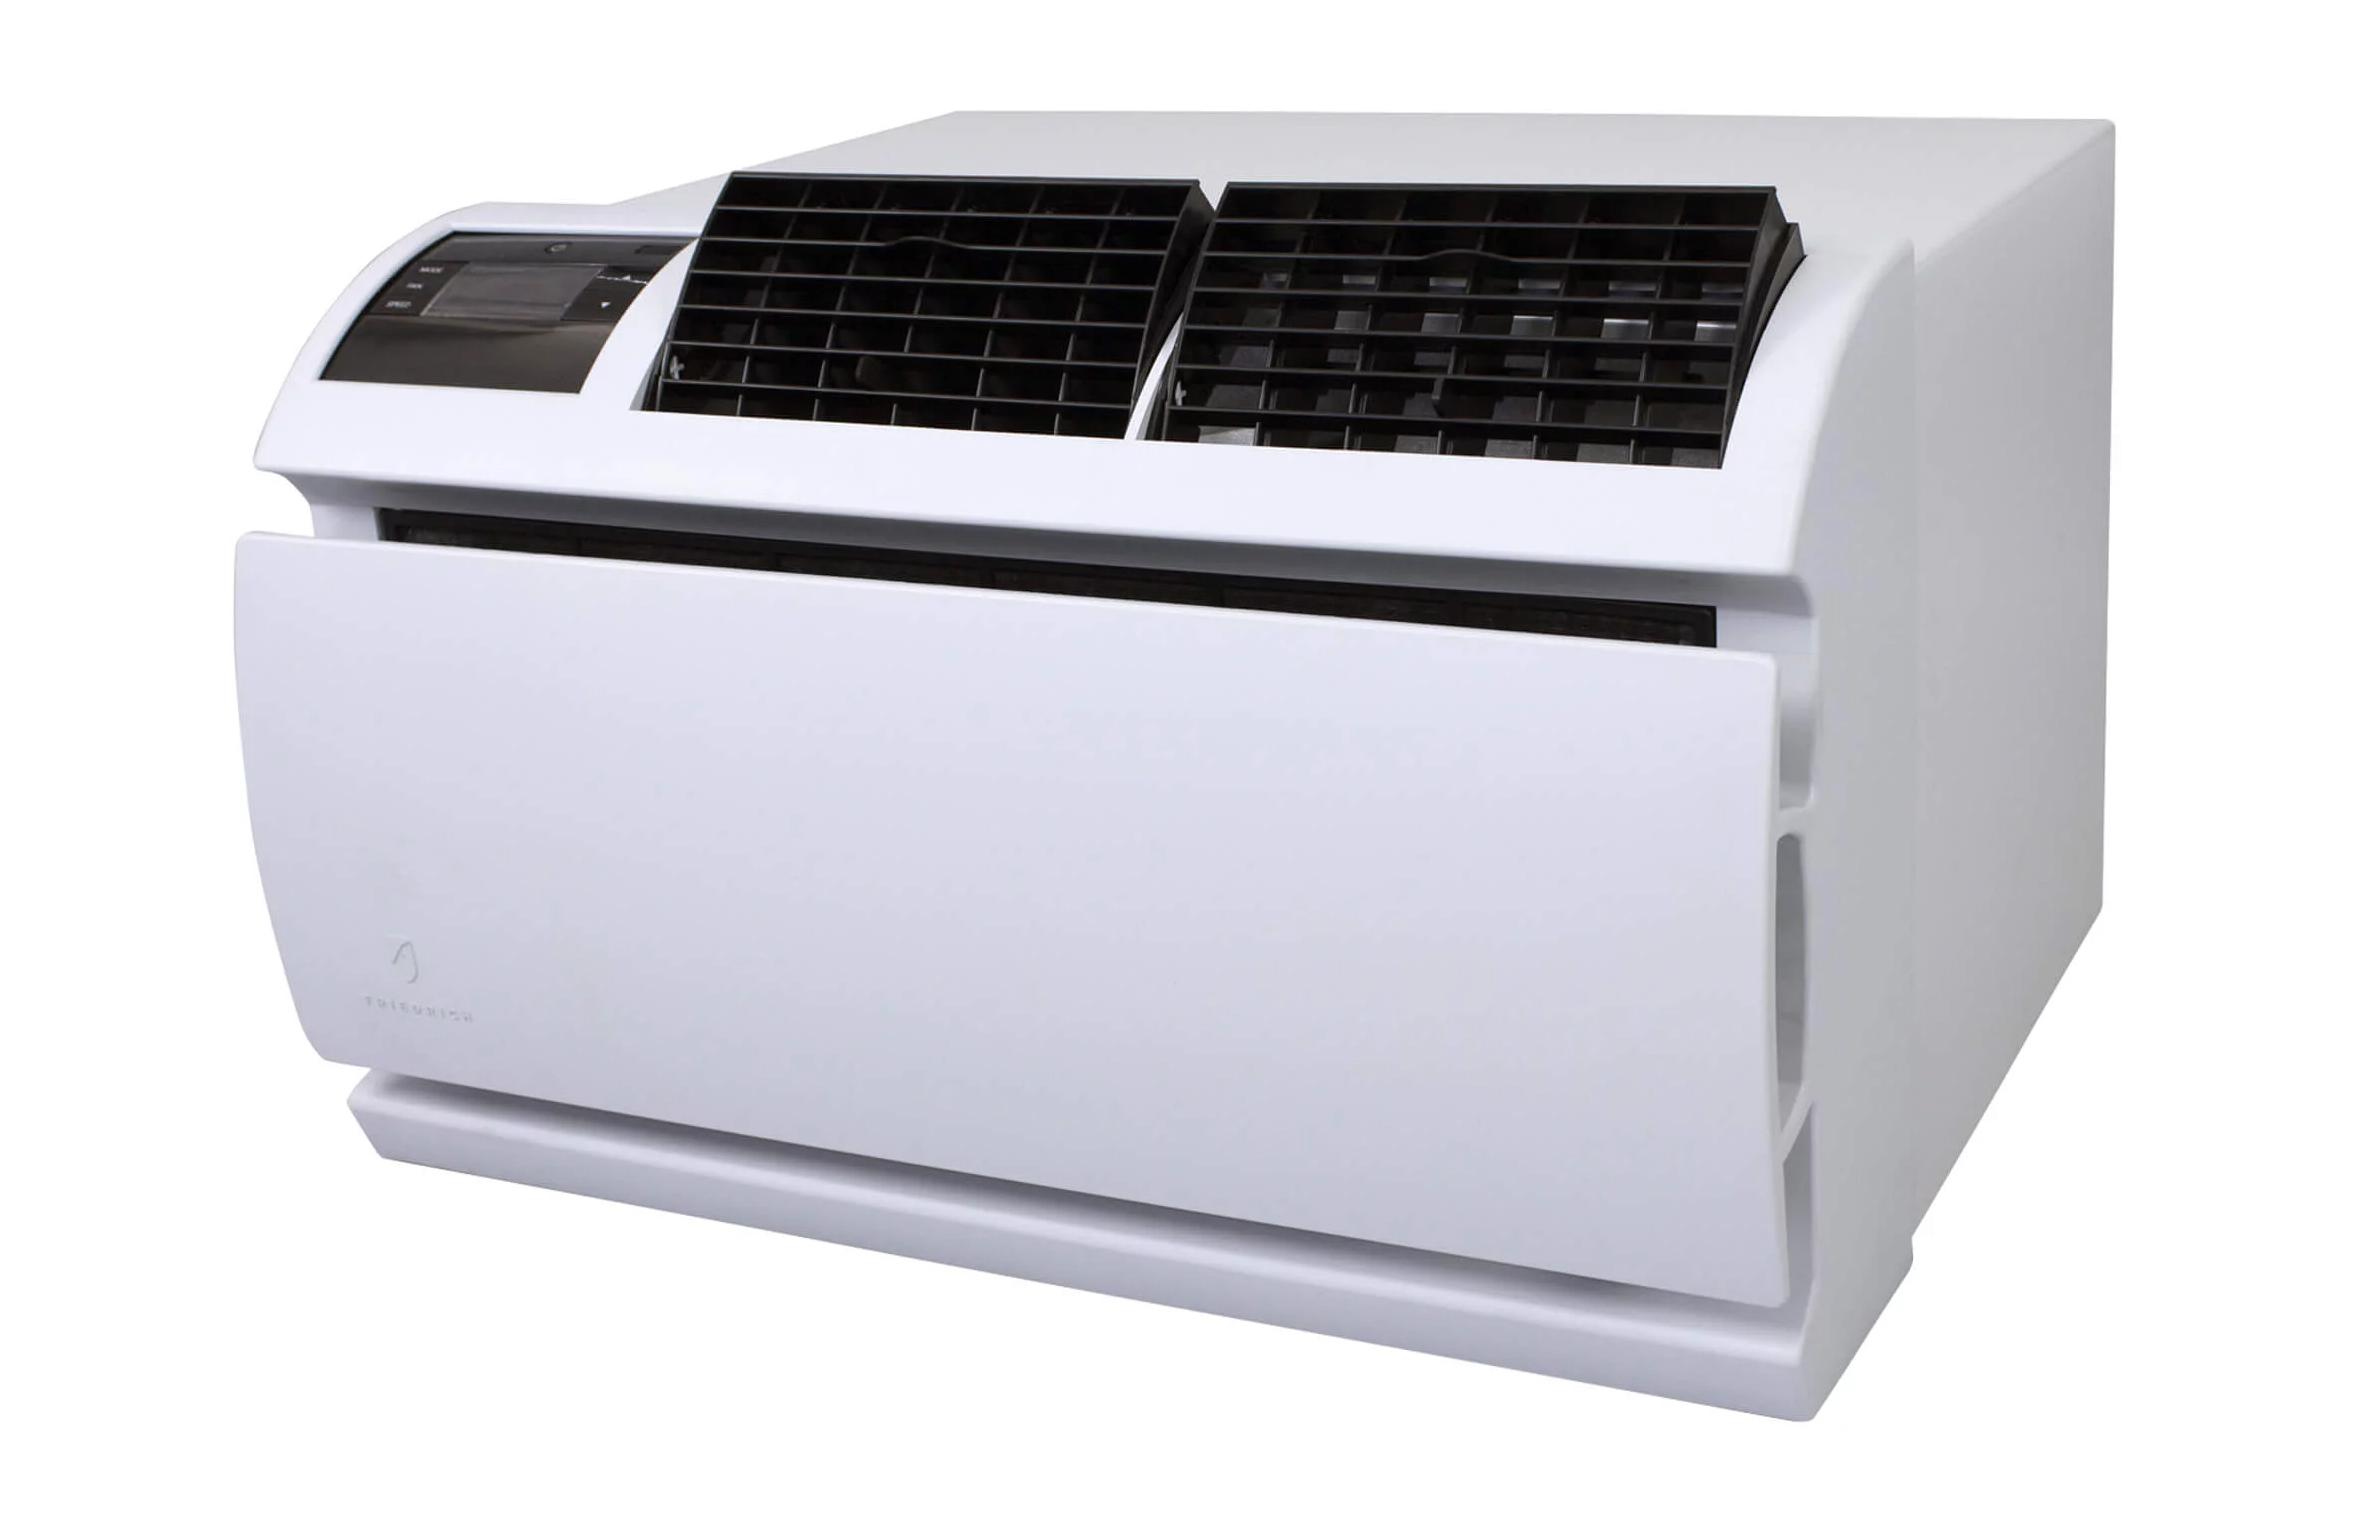 Friedrich WCT12A30A Wallmaster Series 12000 BTU Smart WiFi Through-the-Wall Air Conditioner - 208/230 Volt